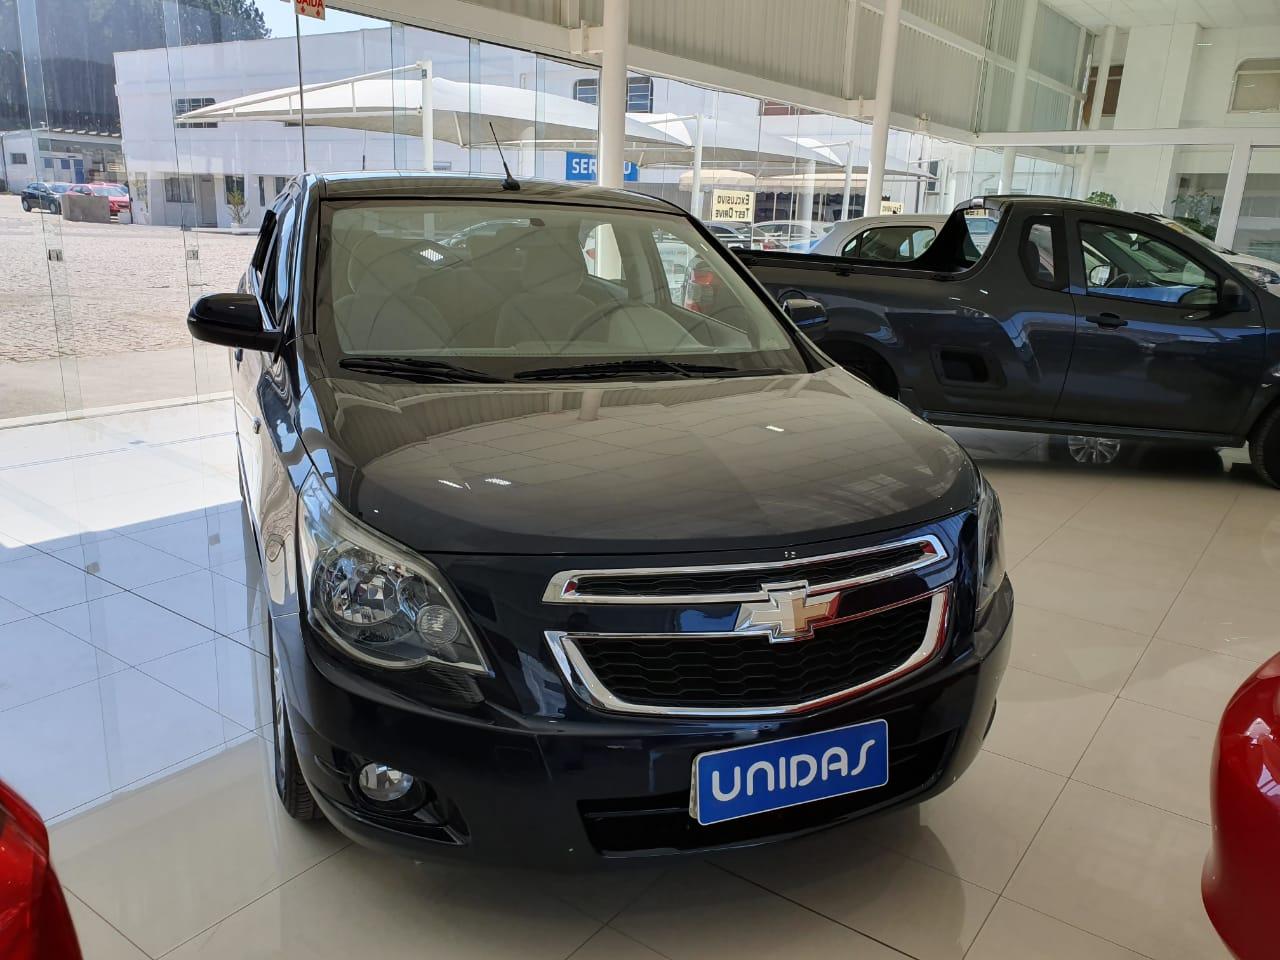 Chevrolet COBALT LTZ 1.8L 2014